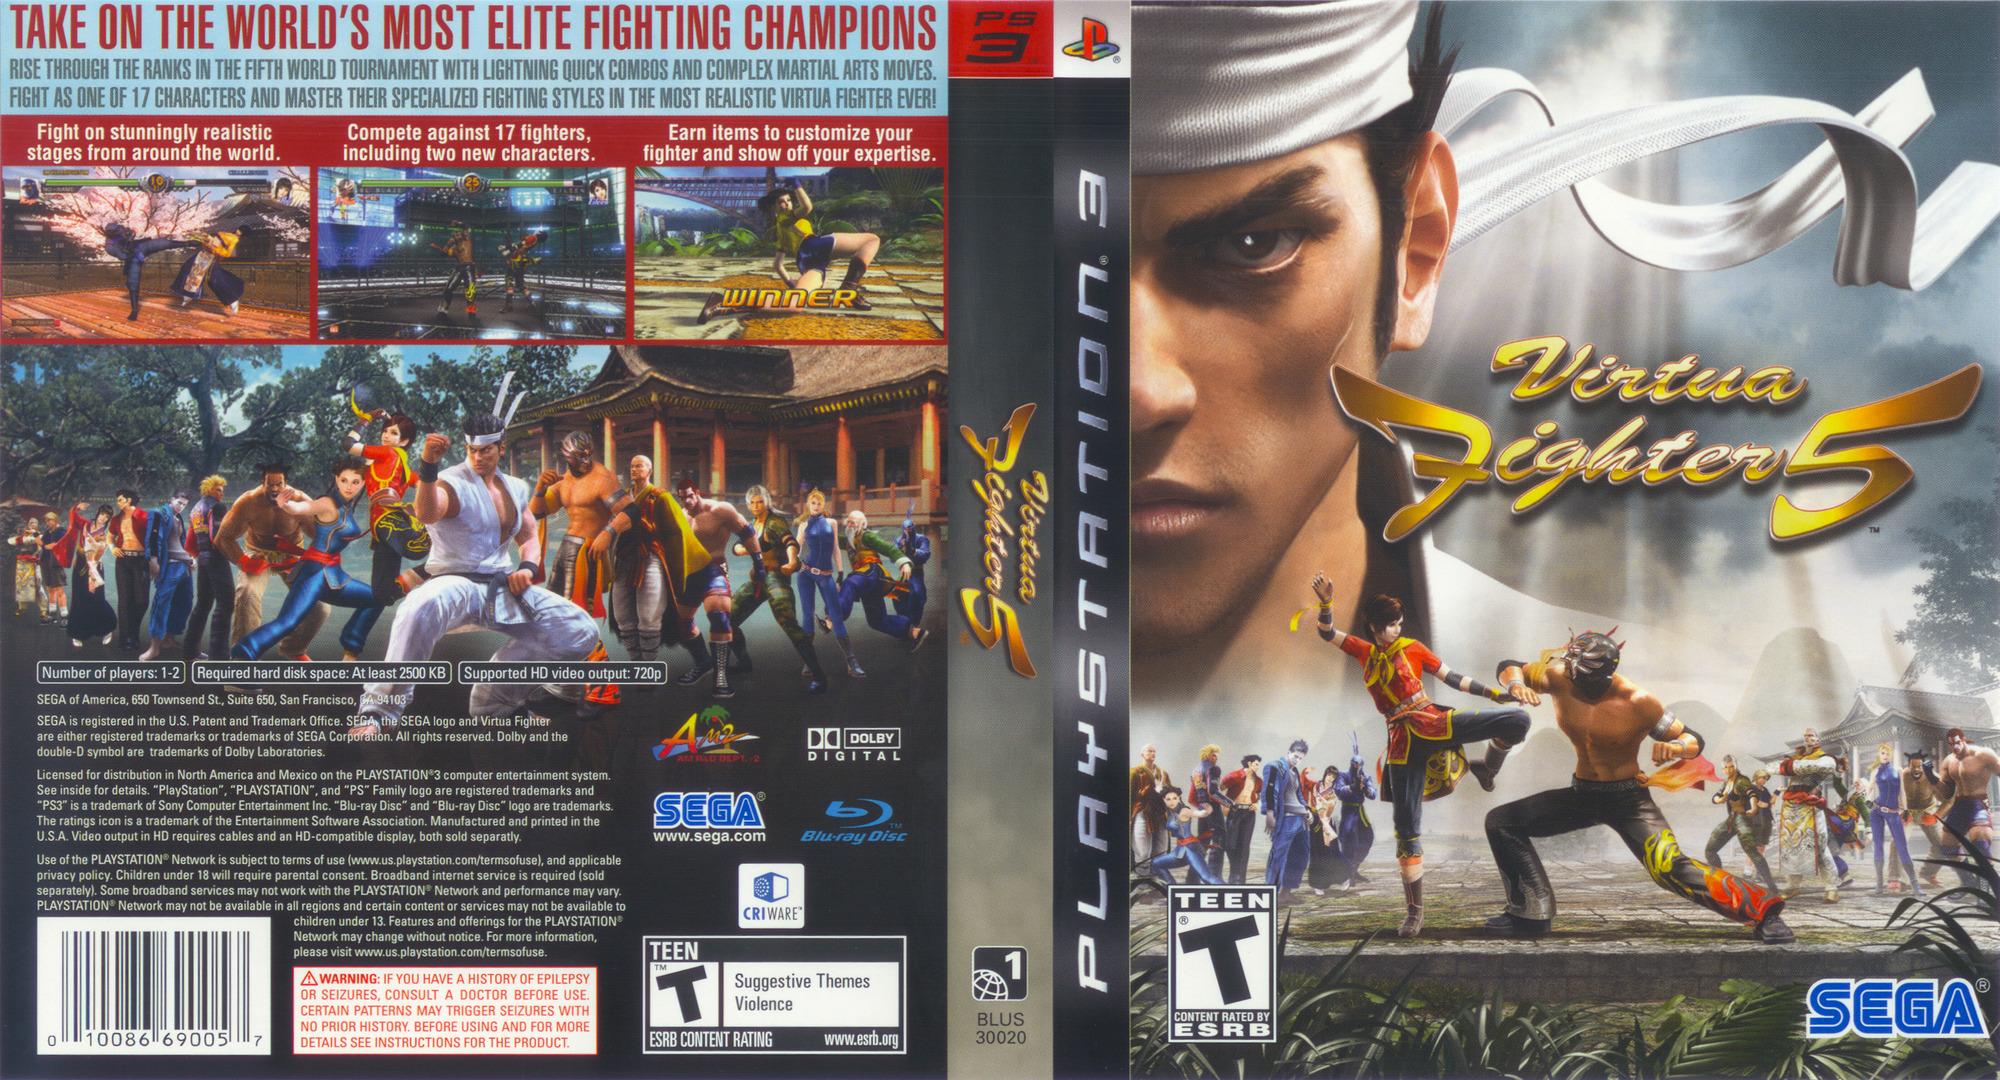 Virtua Fighter 5 PS3 coverfullHQ (BLUS30020)